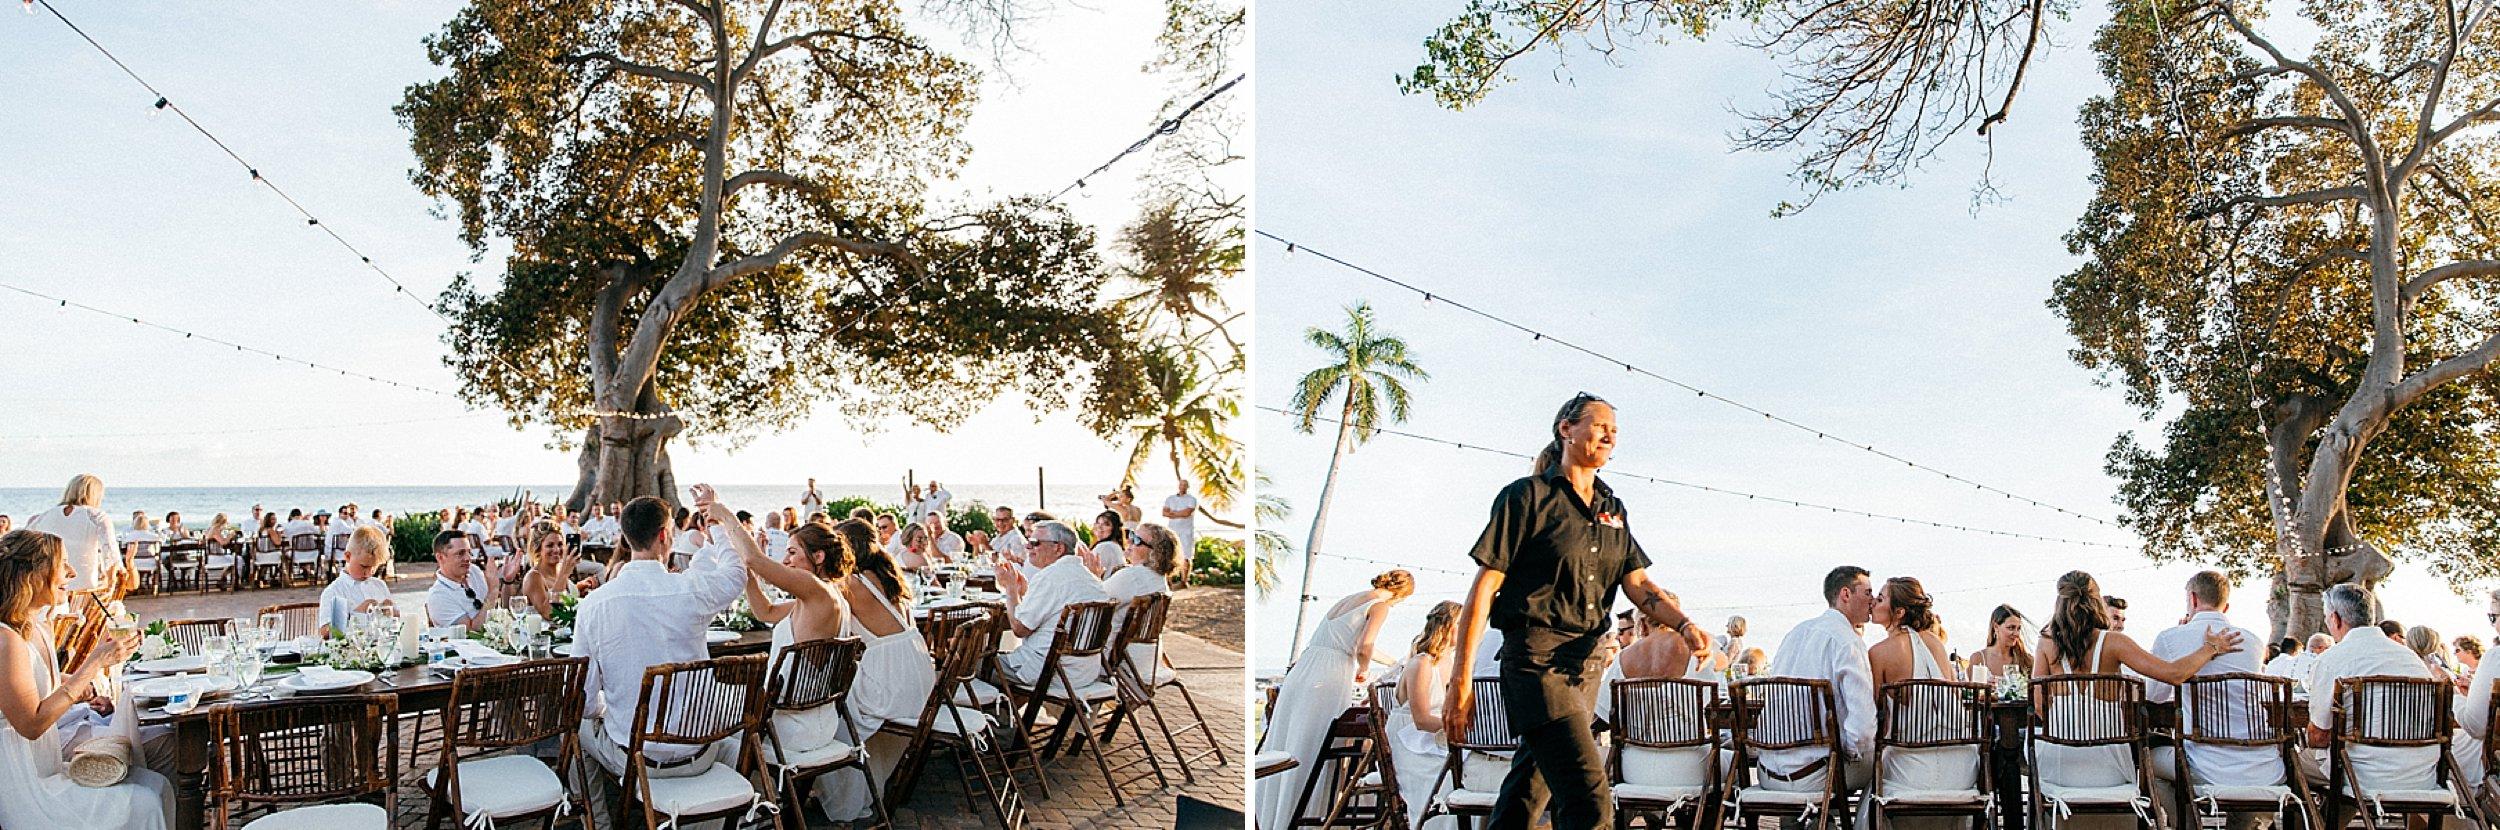 maui-wedding-at-olowalu-plantation-house_0087.jpg